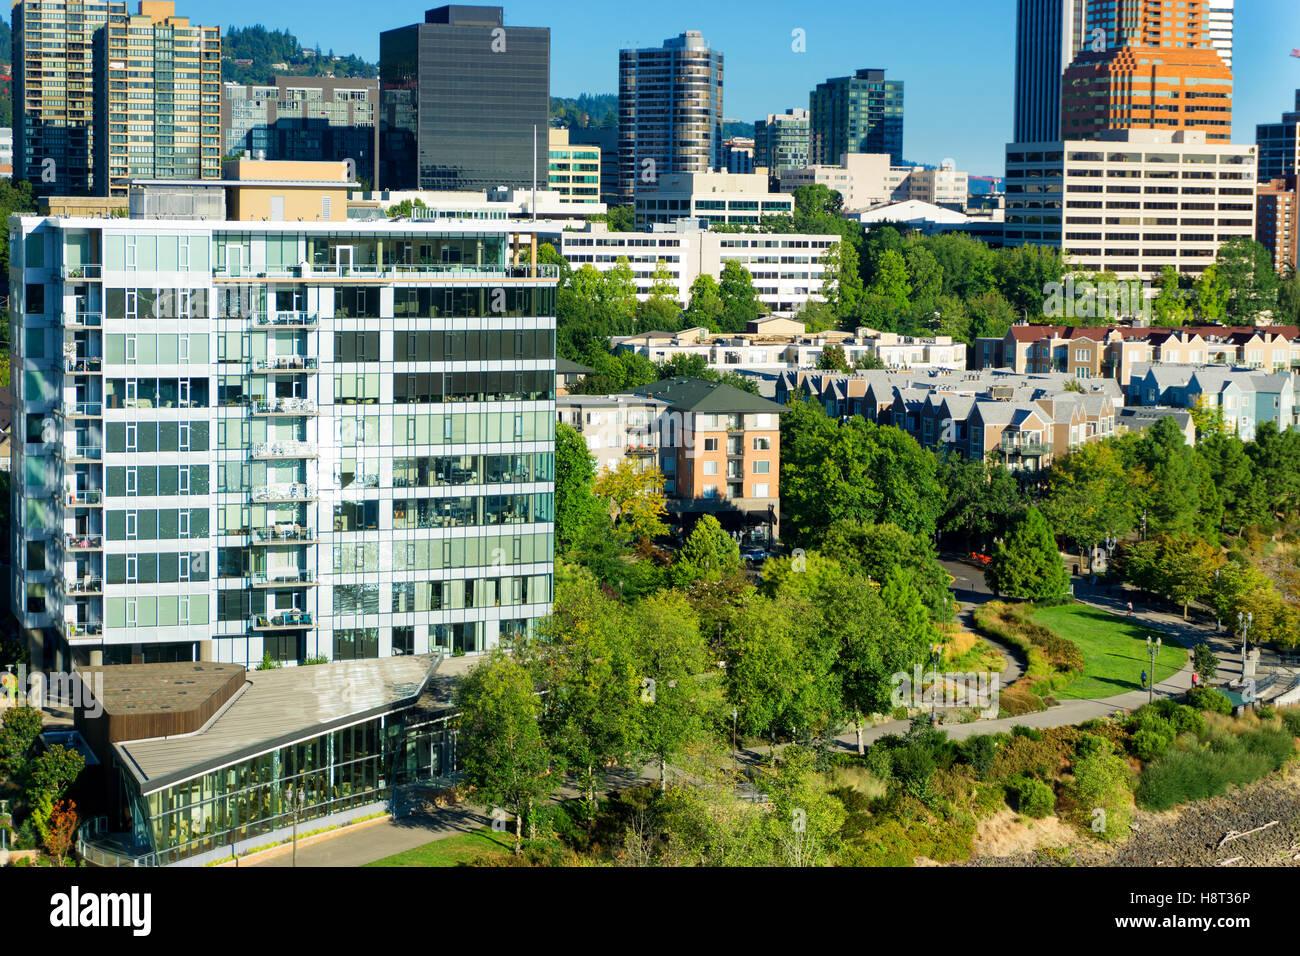 Beautiful view of Portland, Oregon - Stock Image